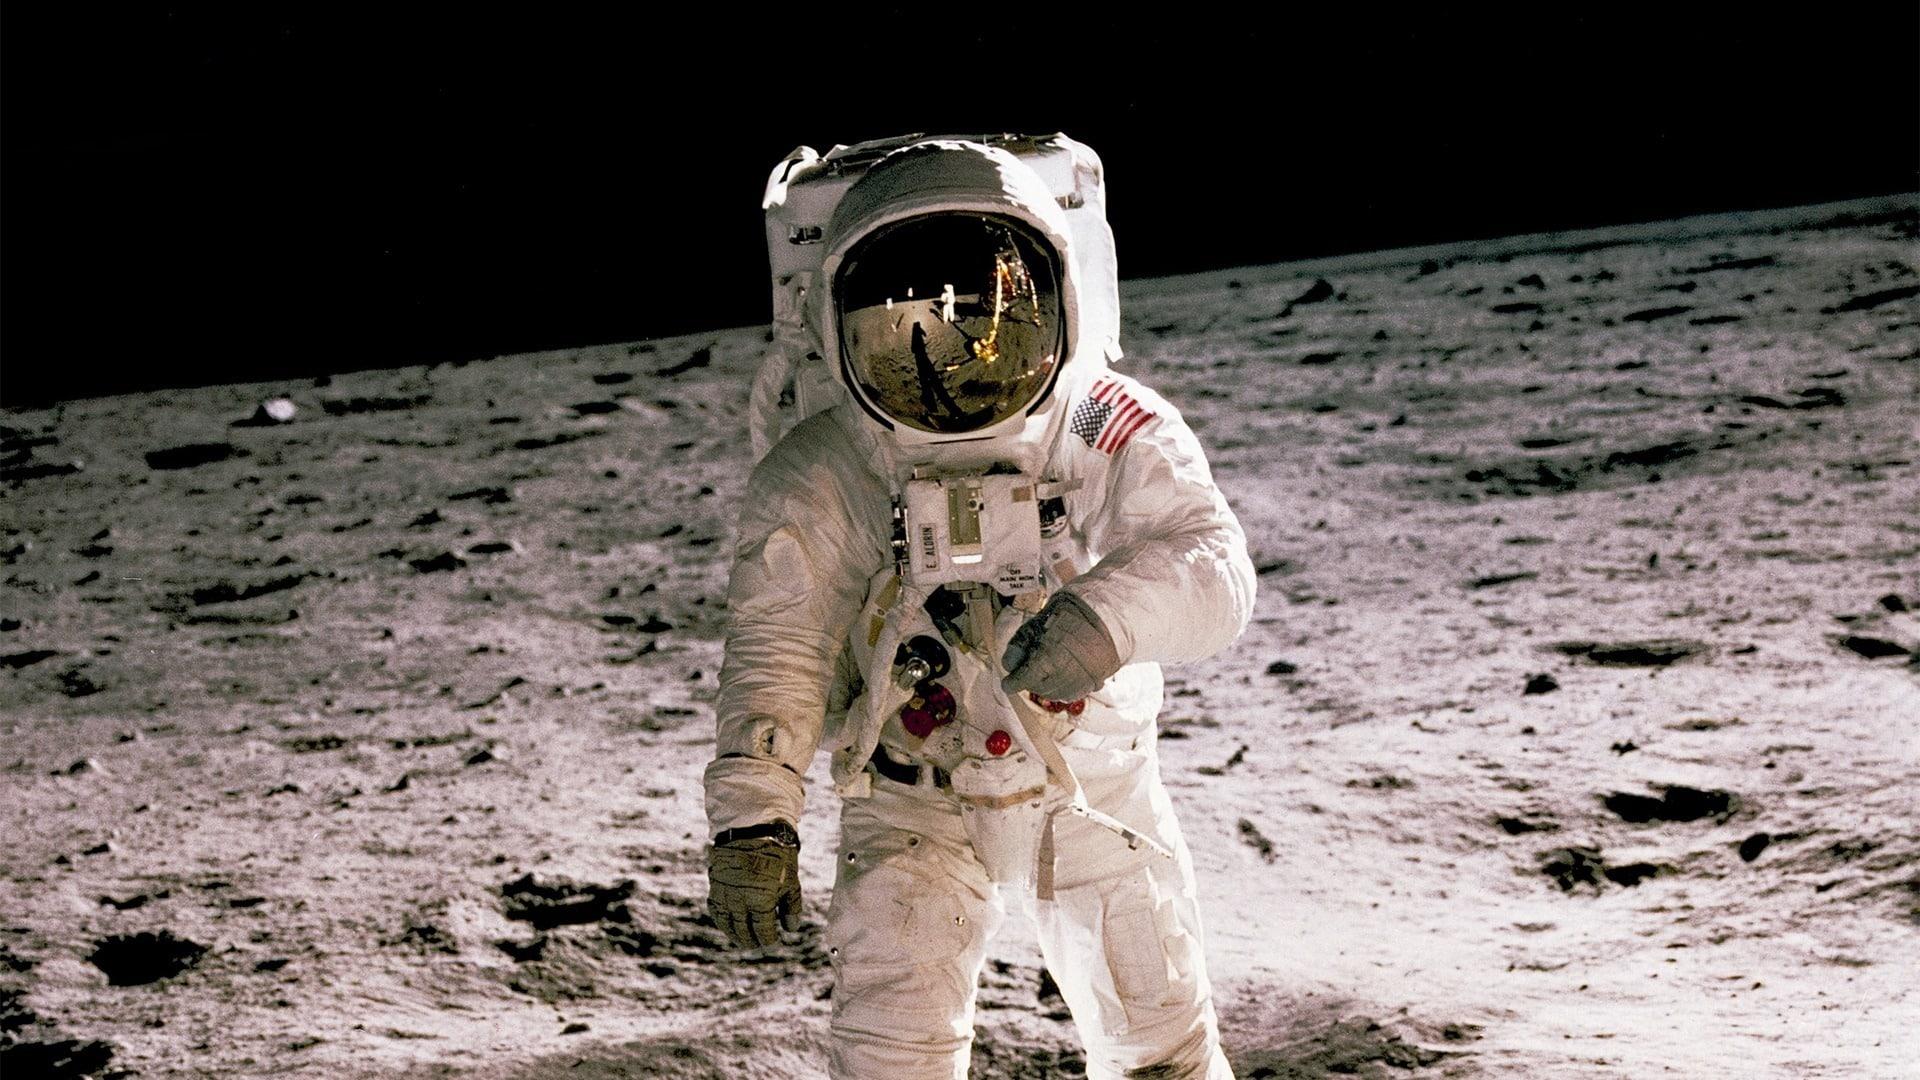 trump spacex tazenie surovin na mesiaci